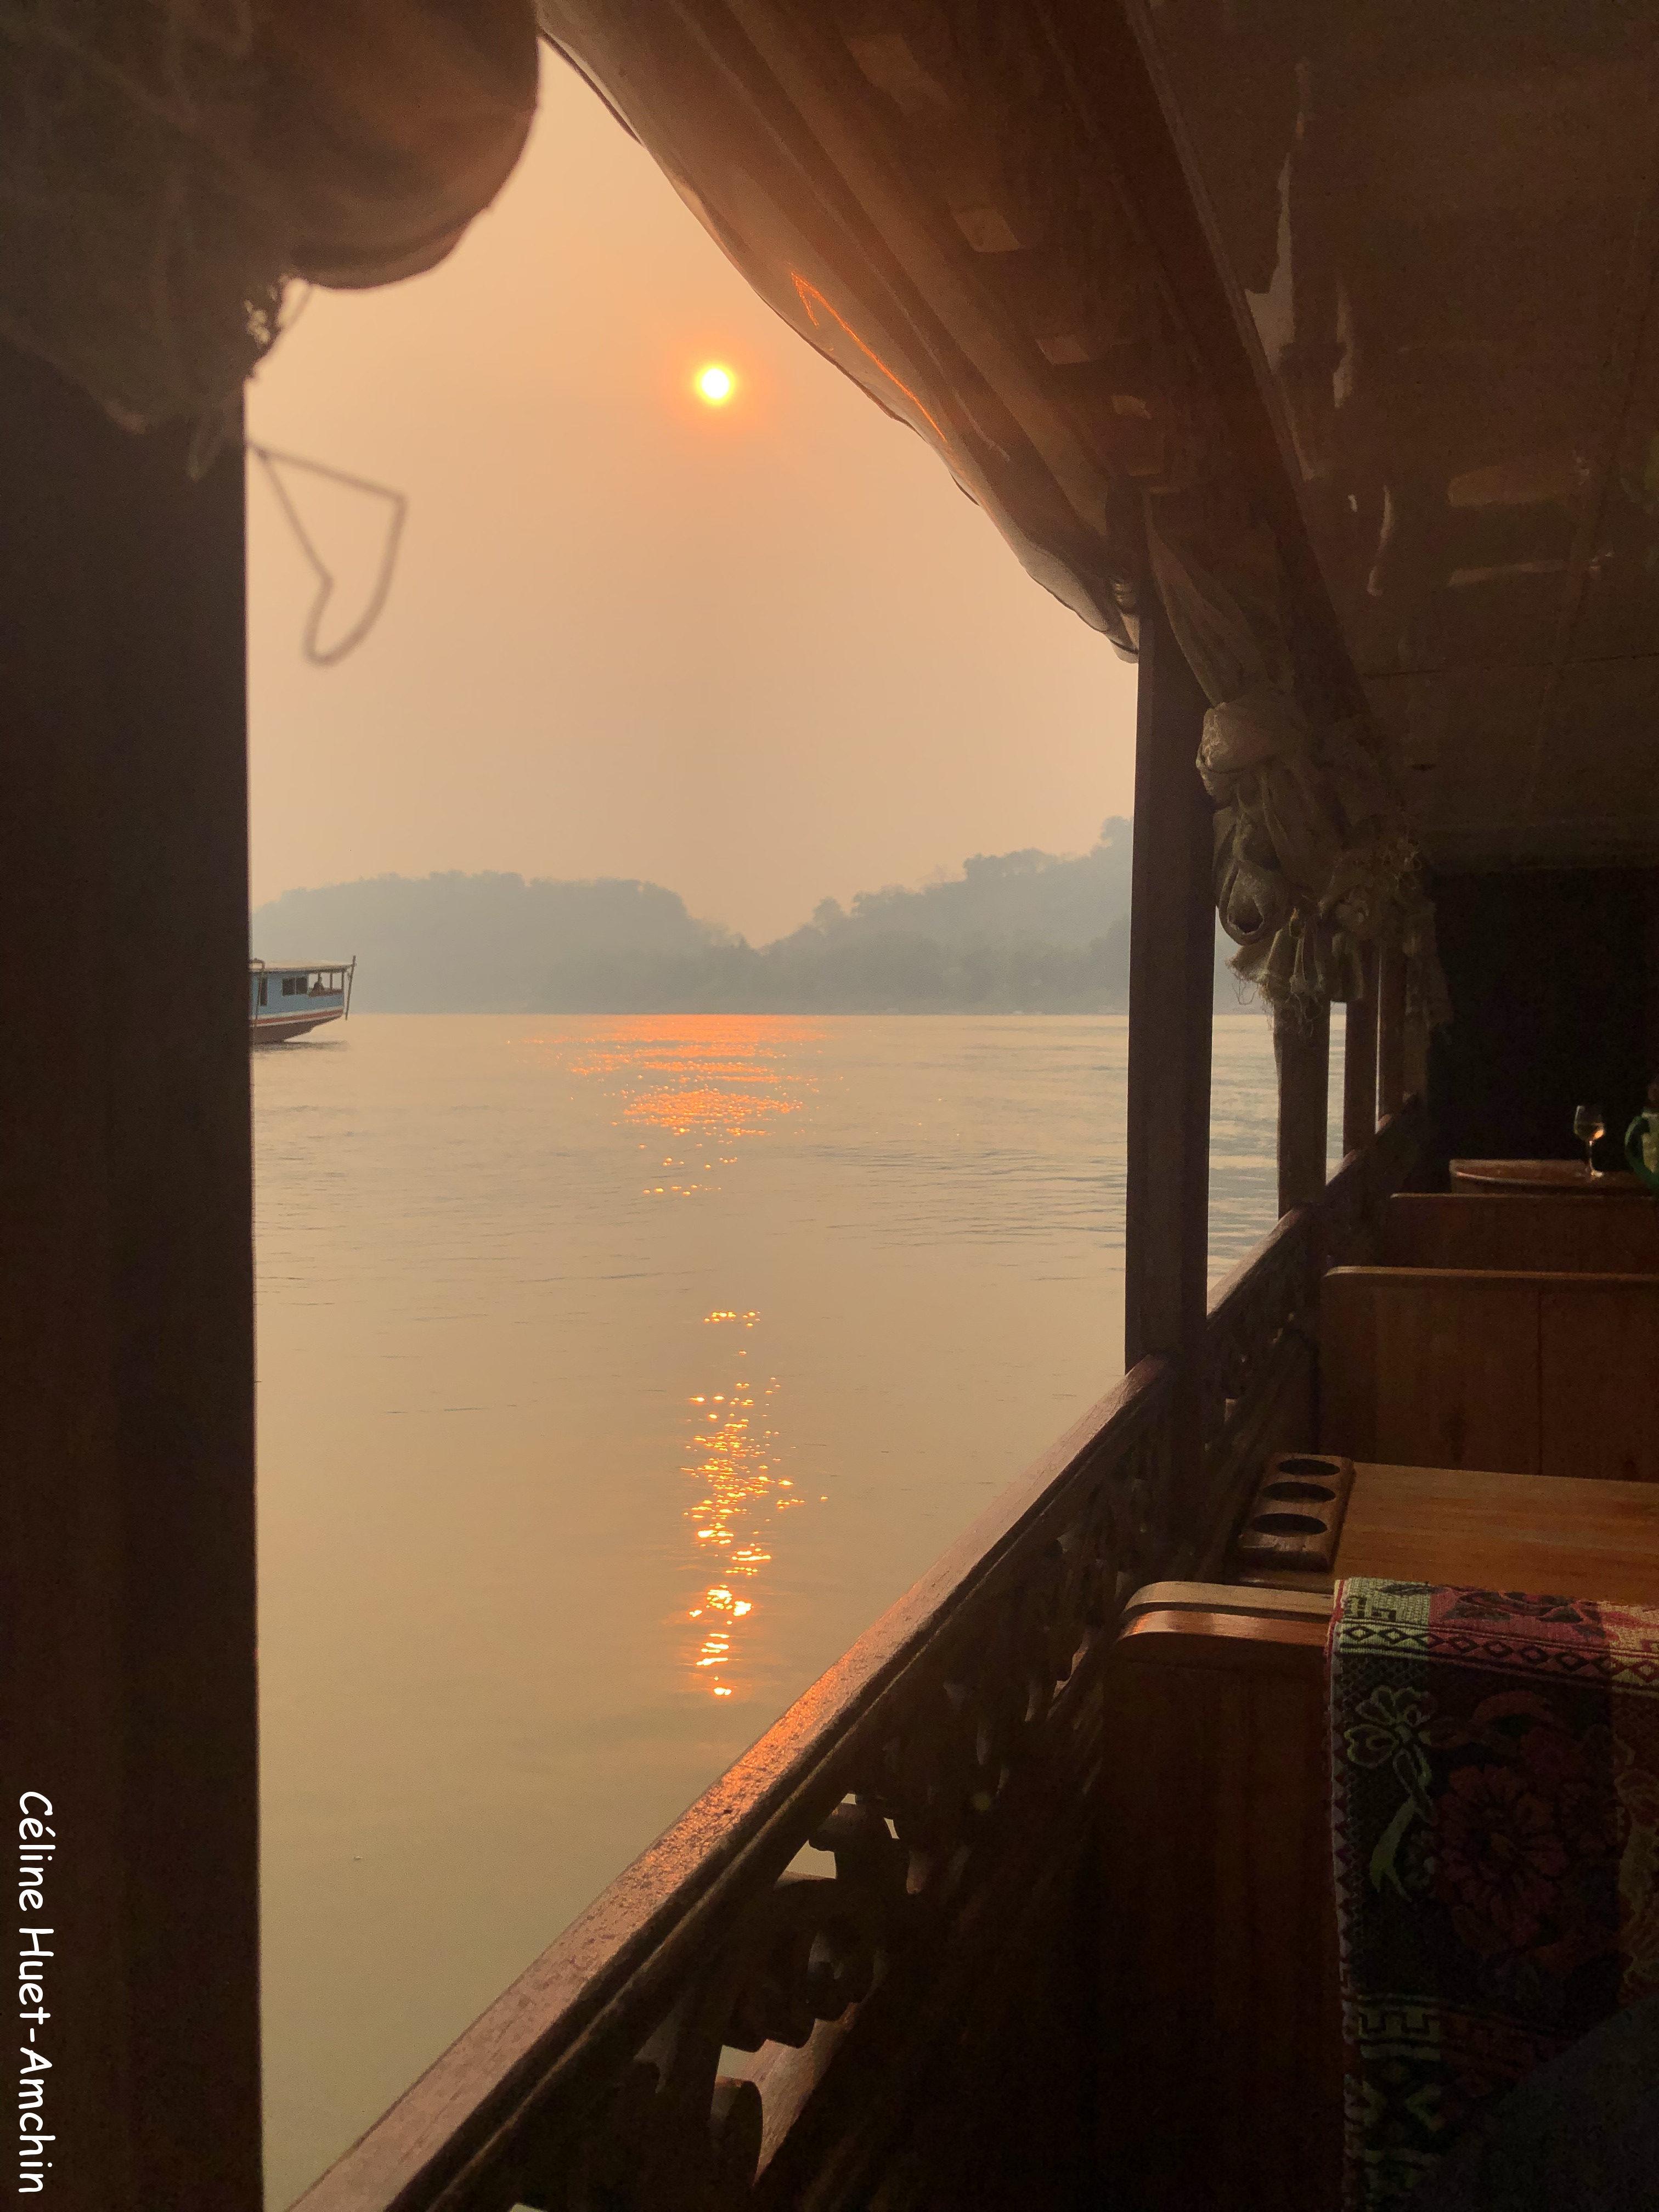 Coucher de soleil Mékong Luang Prabang Laos Asie